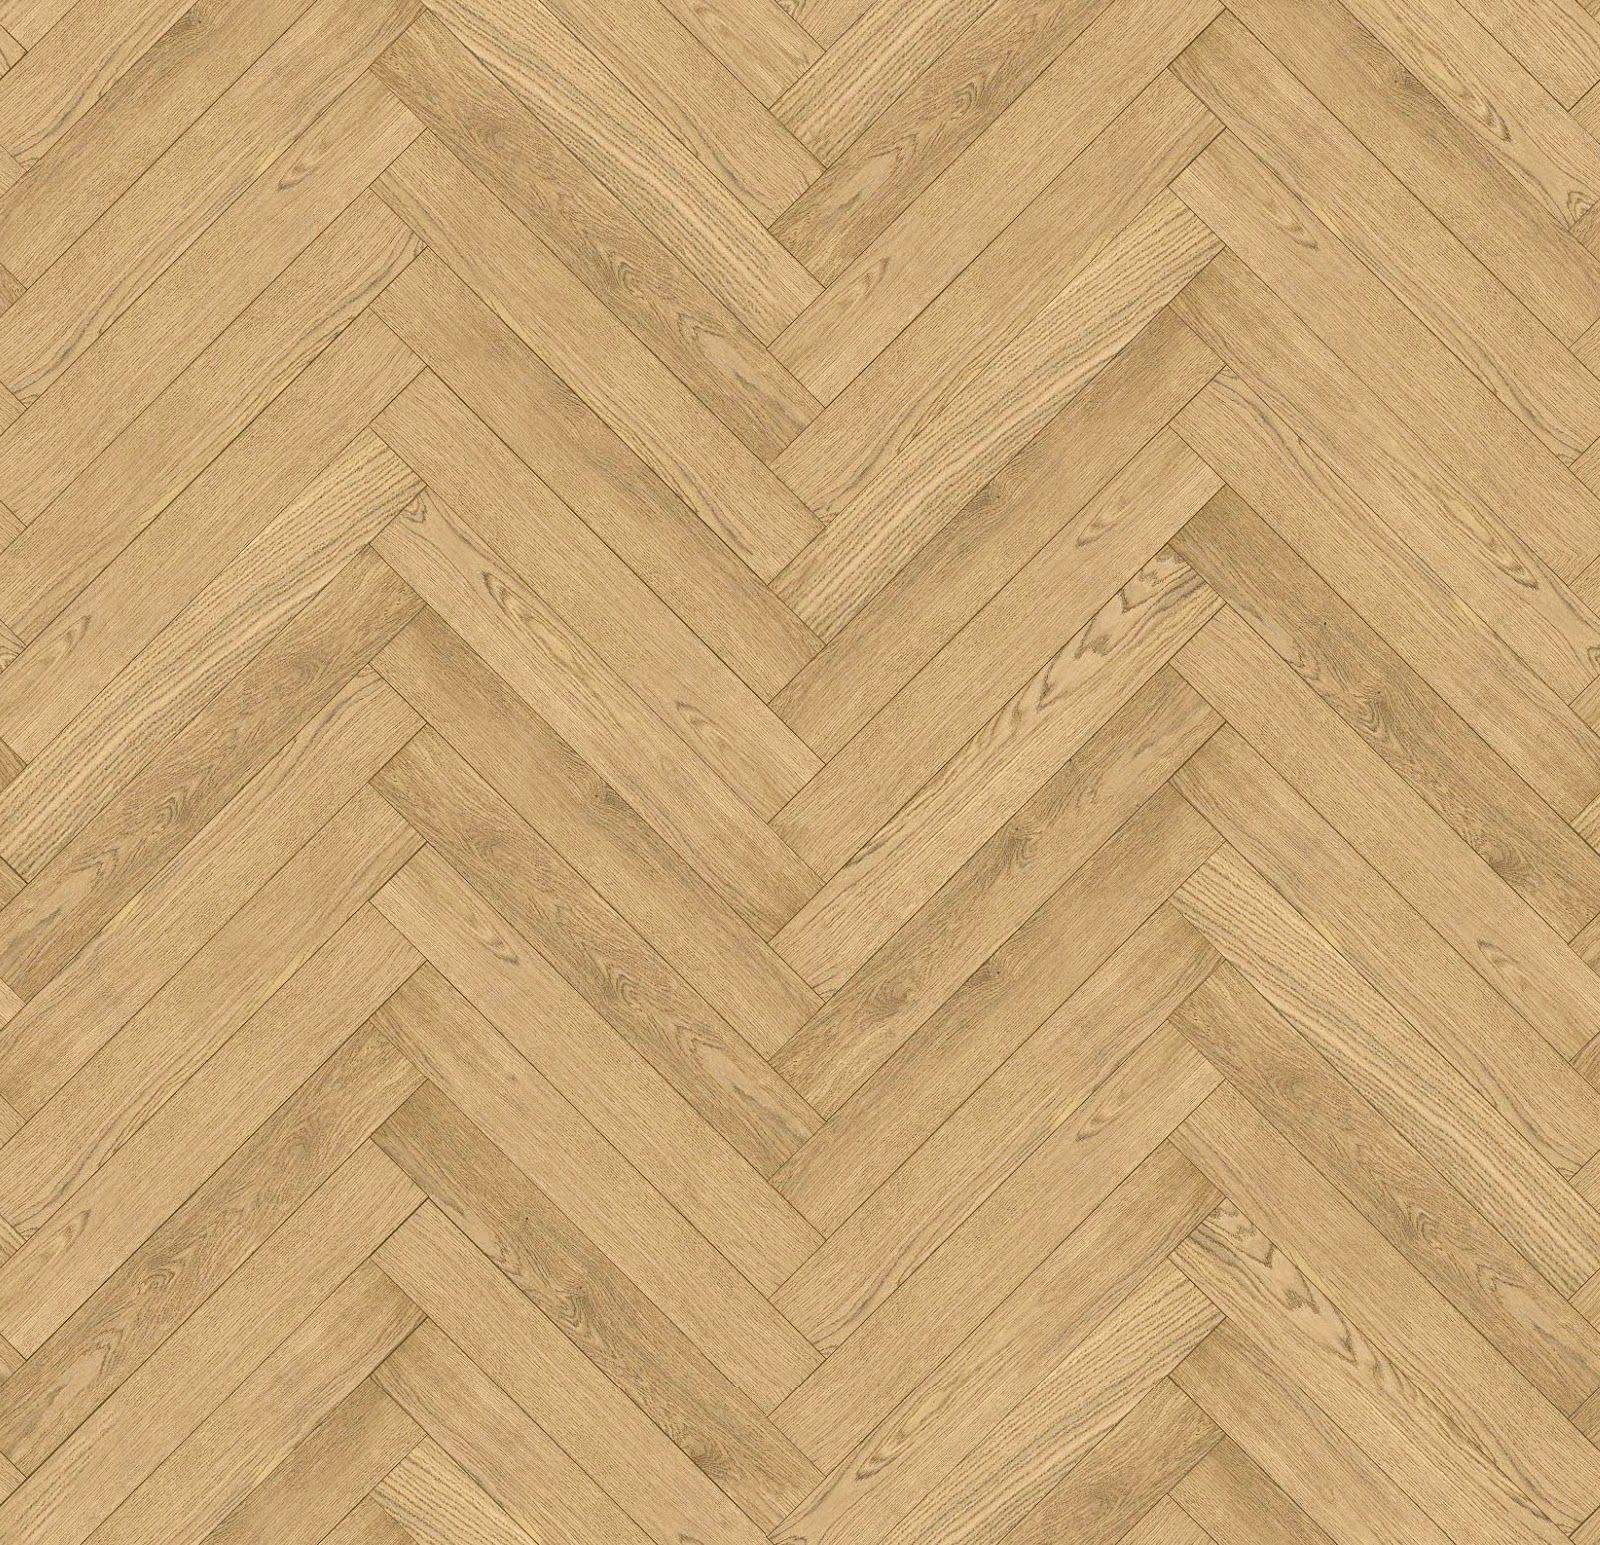 Seamless Wood Parquet Texture + (Maps)  Parquet texture